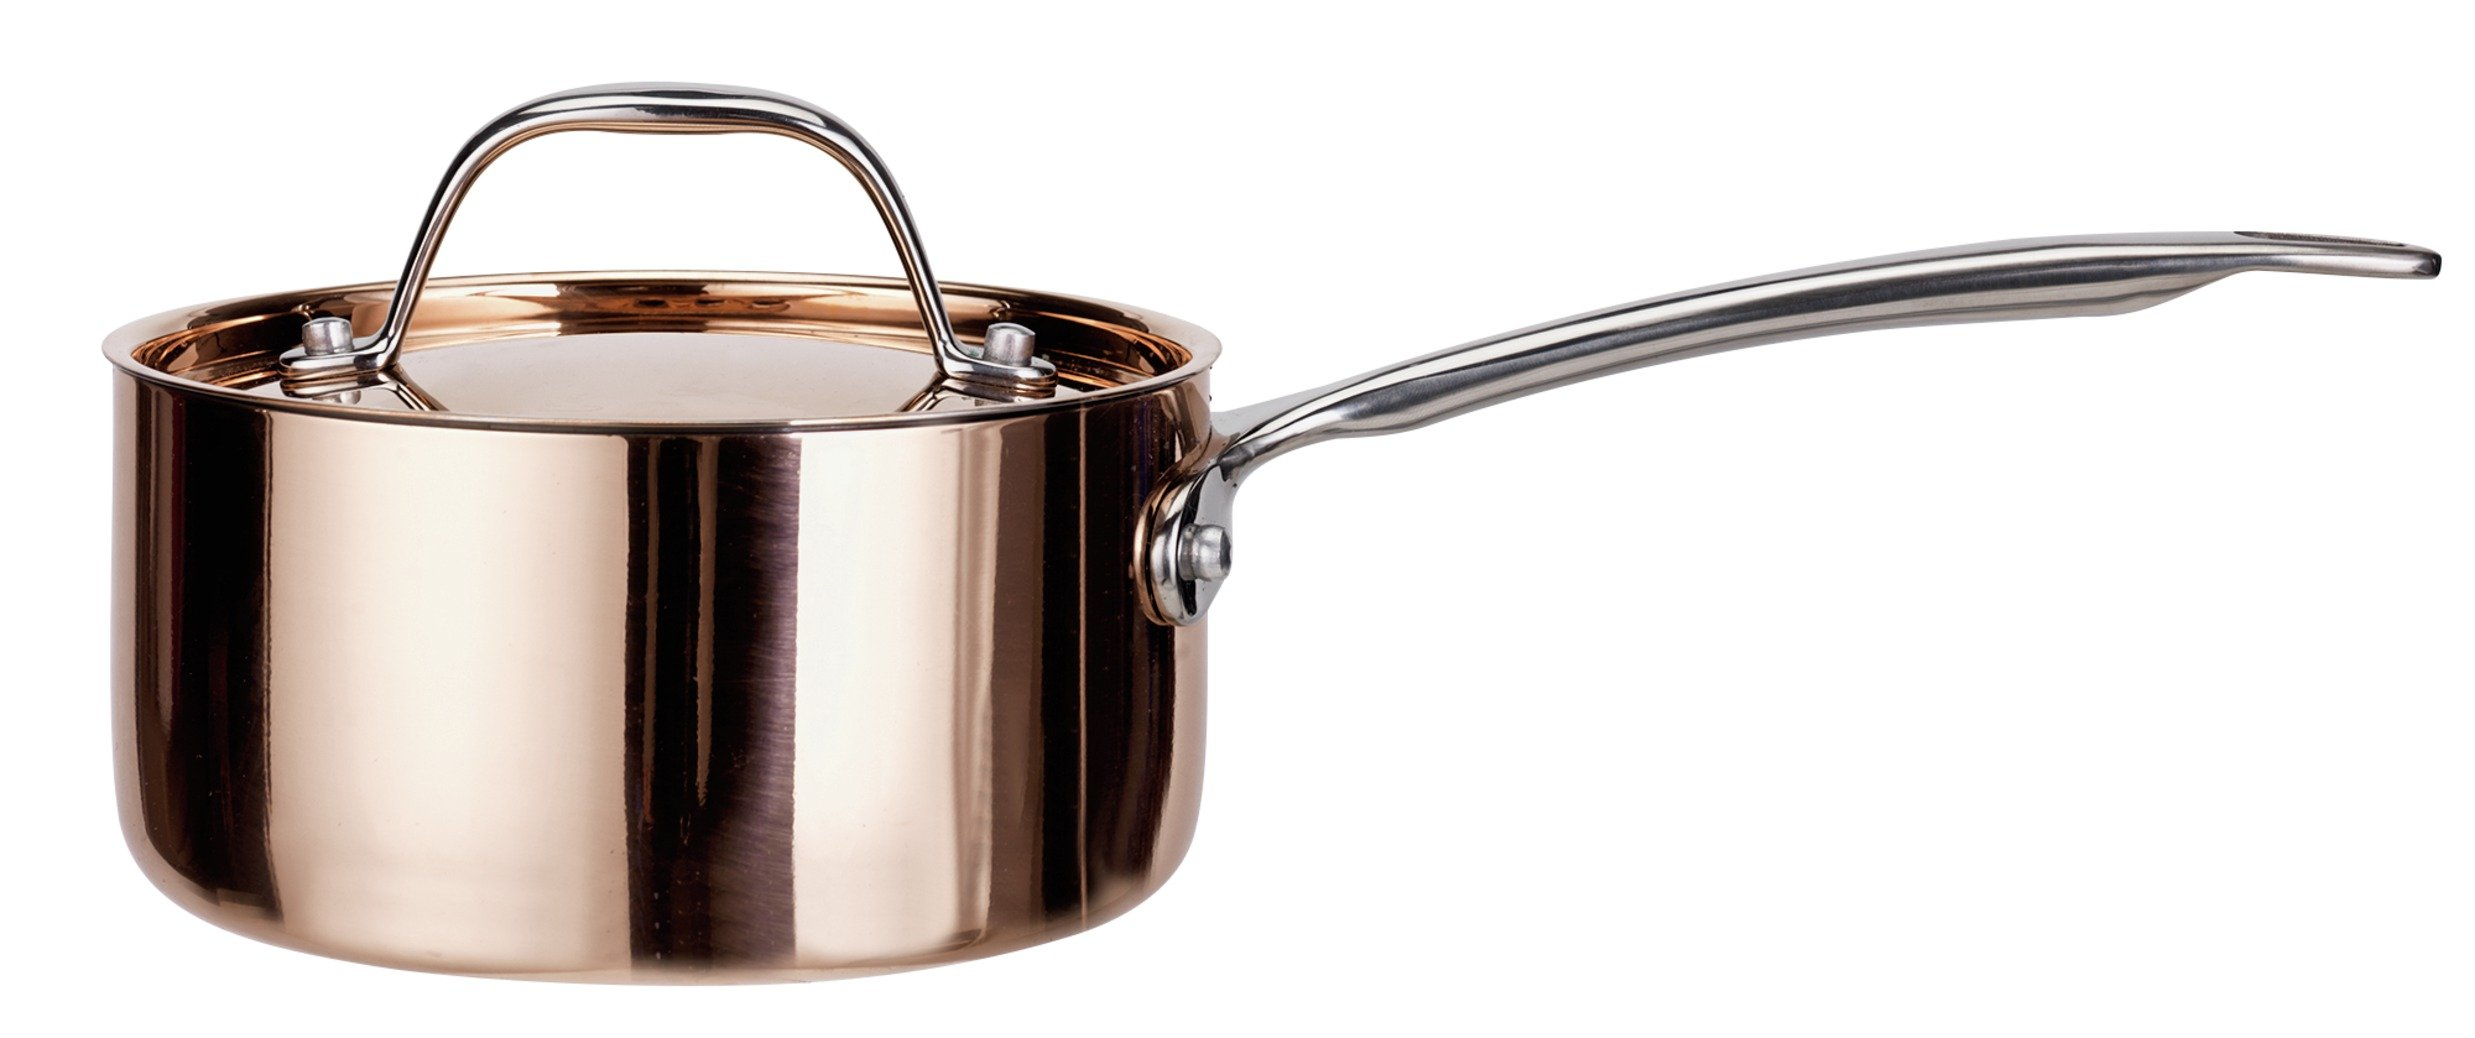 Sainsbury's Home Cooks Collection 16cm Copper Saucepan & Lid